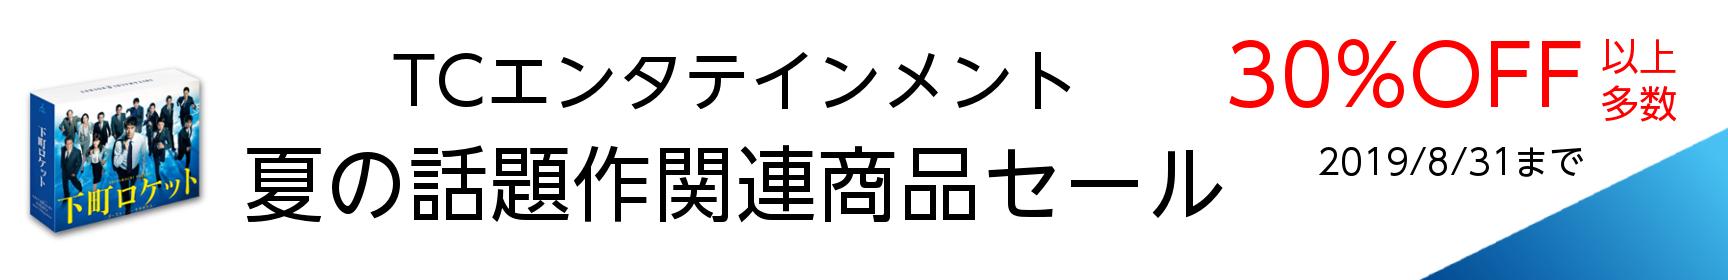 TCエンタテインメント 夏の話題作関連商品セール